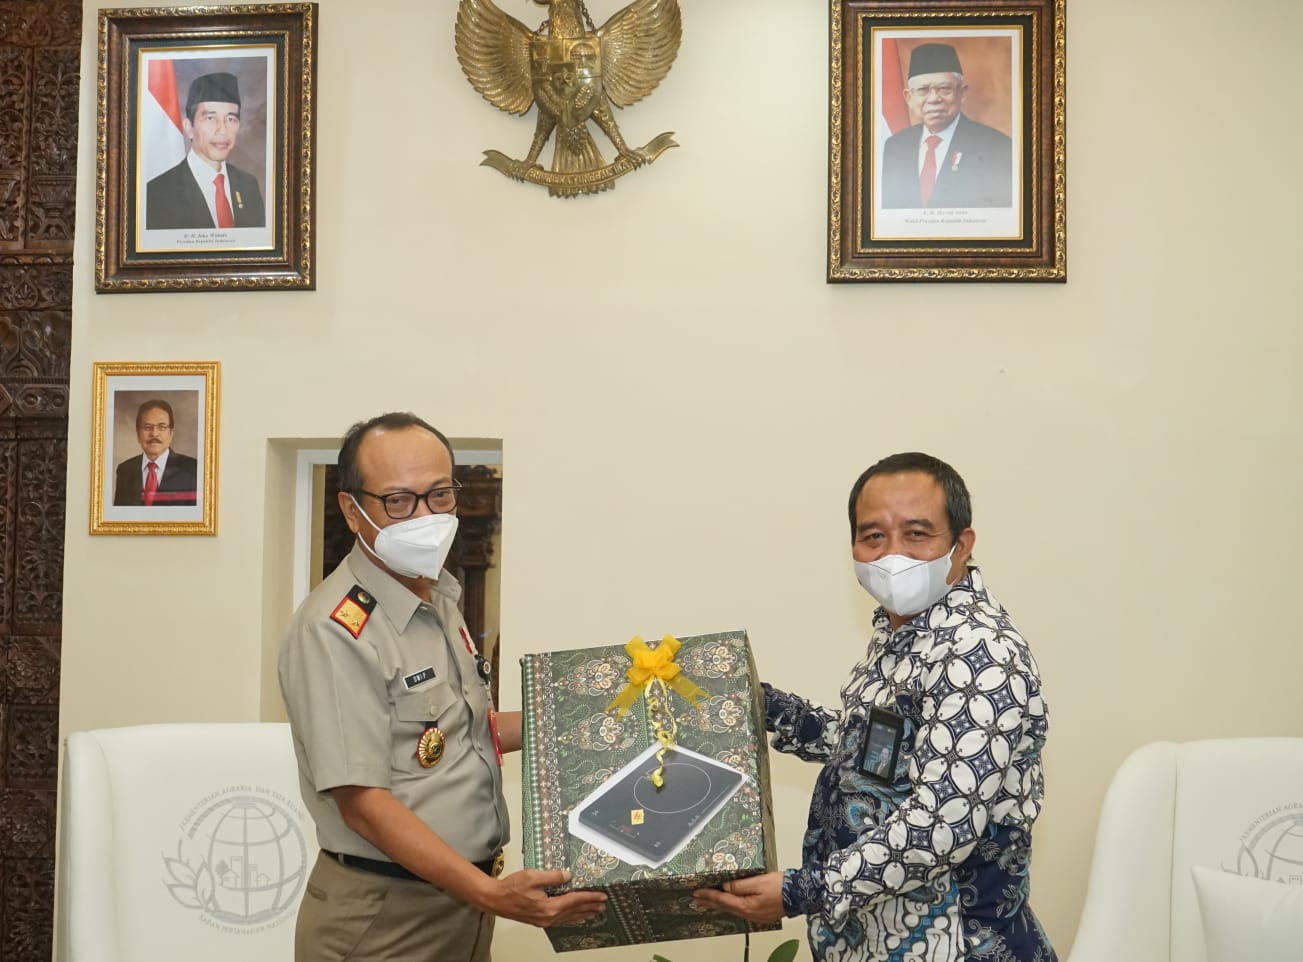 Kepala Kantor Wilayah Badan Pertanahan Nasional (BPN) Jawa Tengah, Dwi Purnama, menerima kunjungan dari pimpinan unit induk PLN di Wilayah Jawa Tengah Jumat, (24/9).